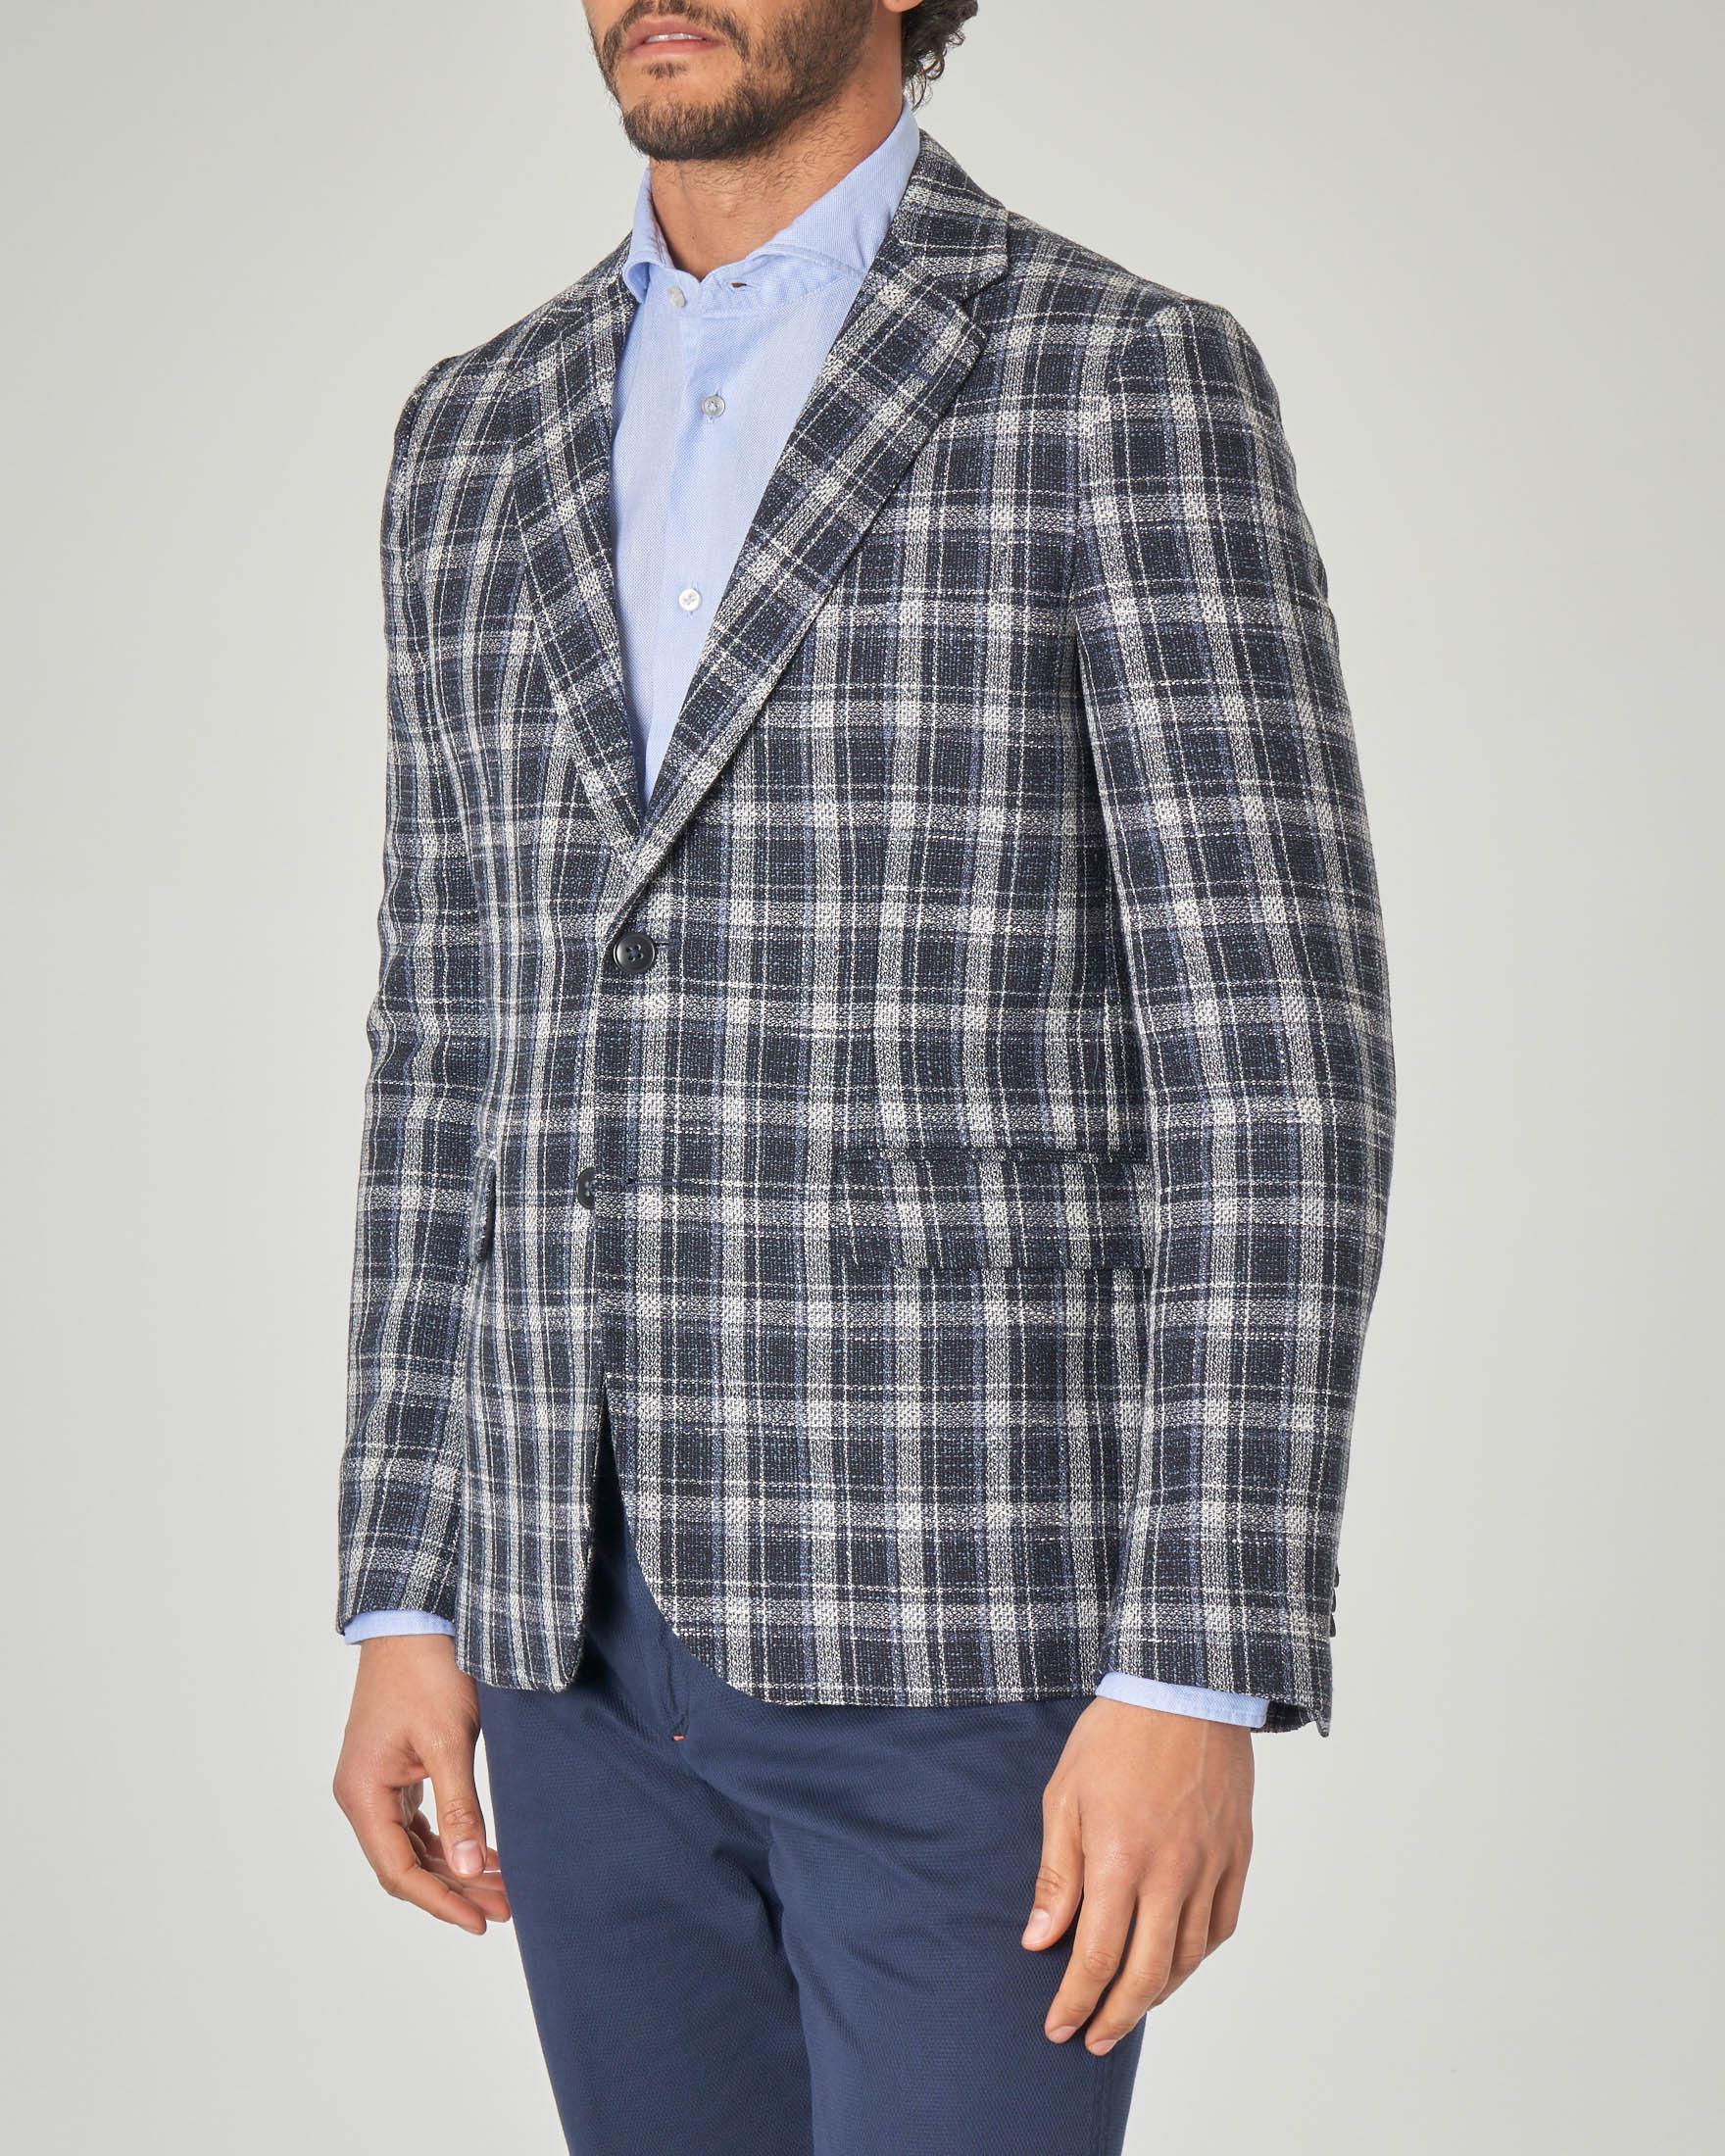 Blazer blu in lana e cotone a quadri blu e grigi